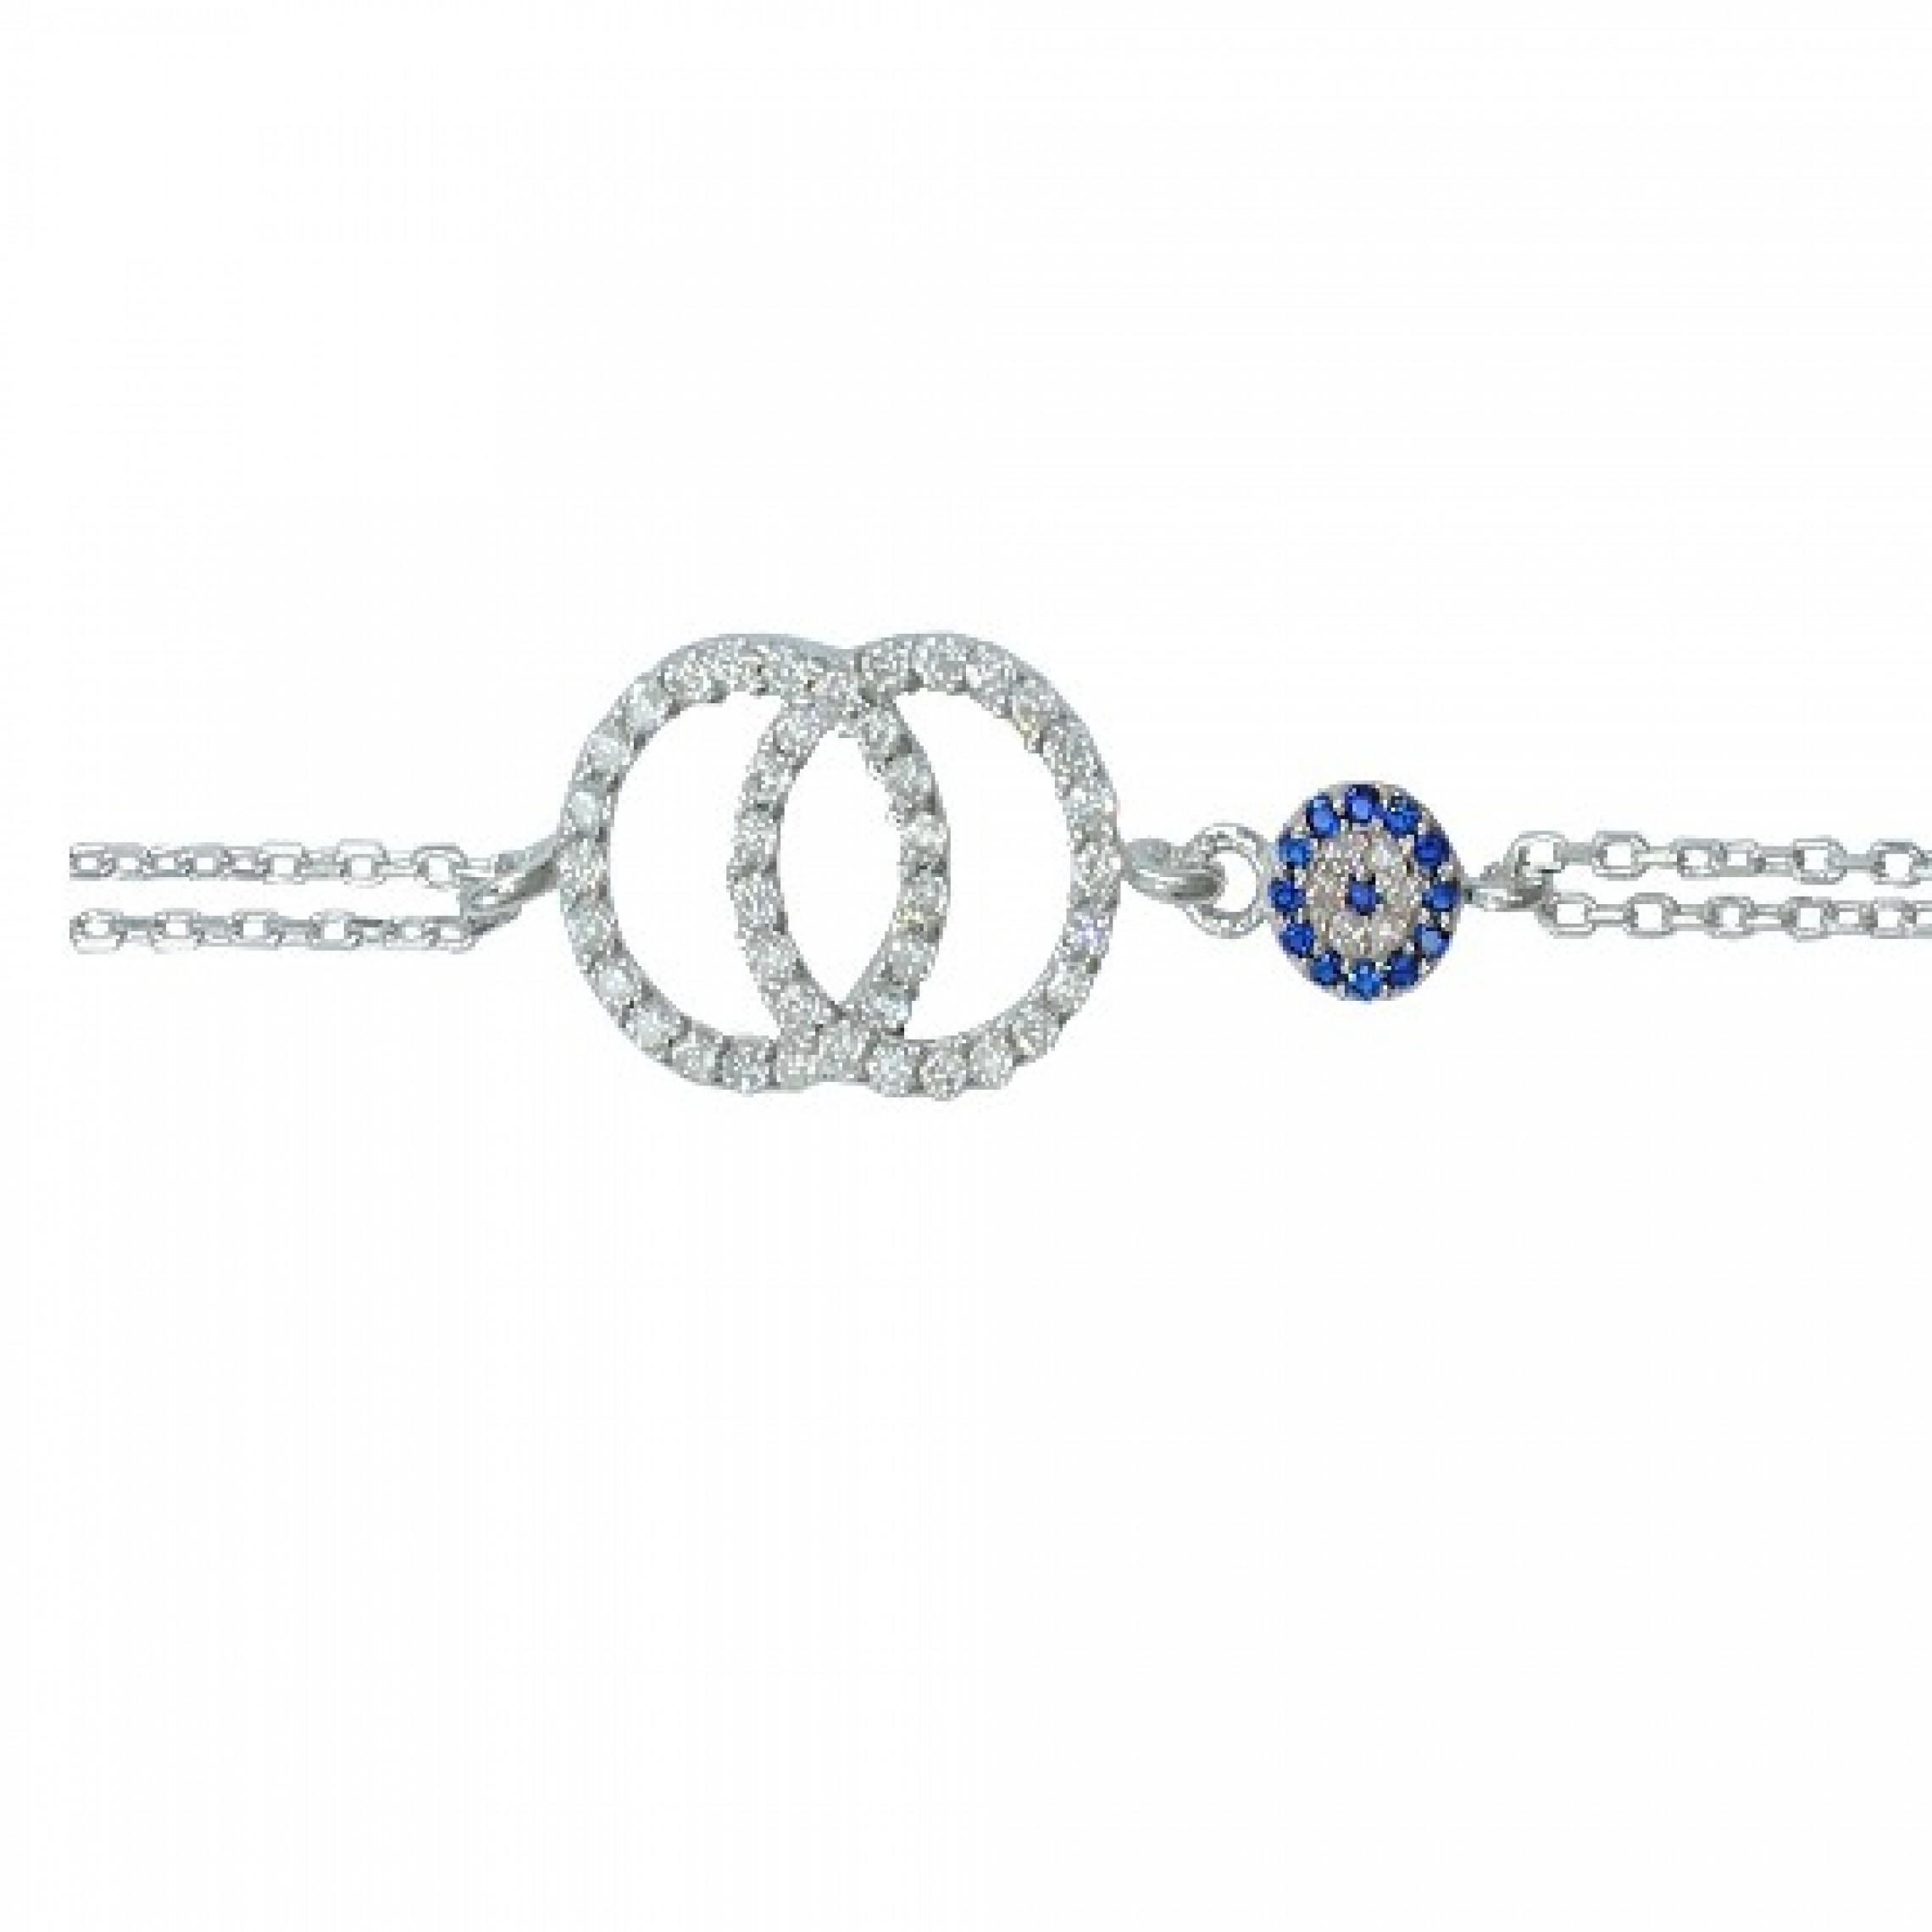 SB-76 Evil Eye 925 Sterling Silver CZ Bracelet